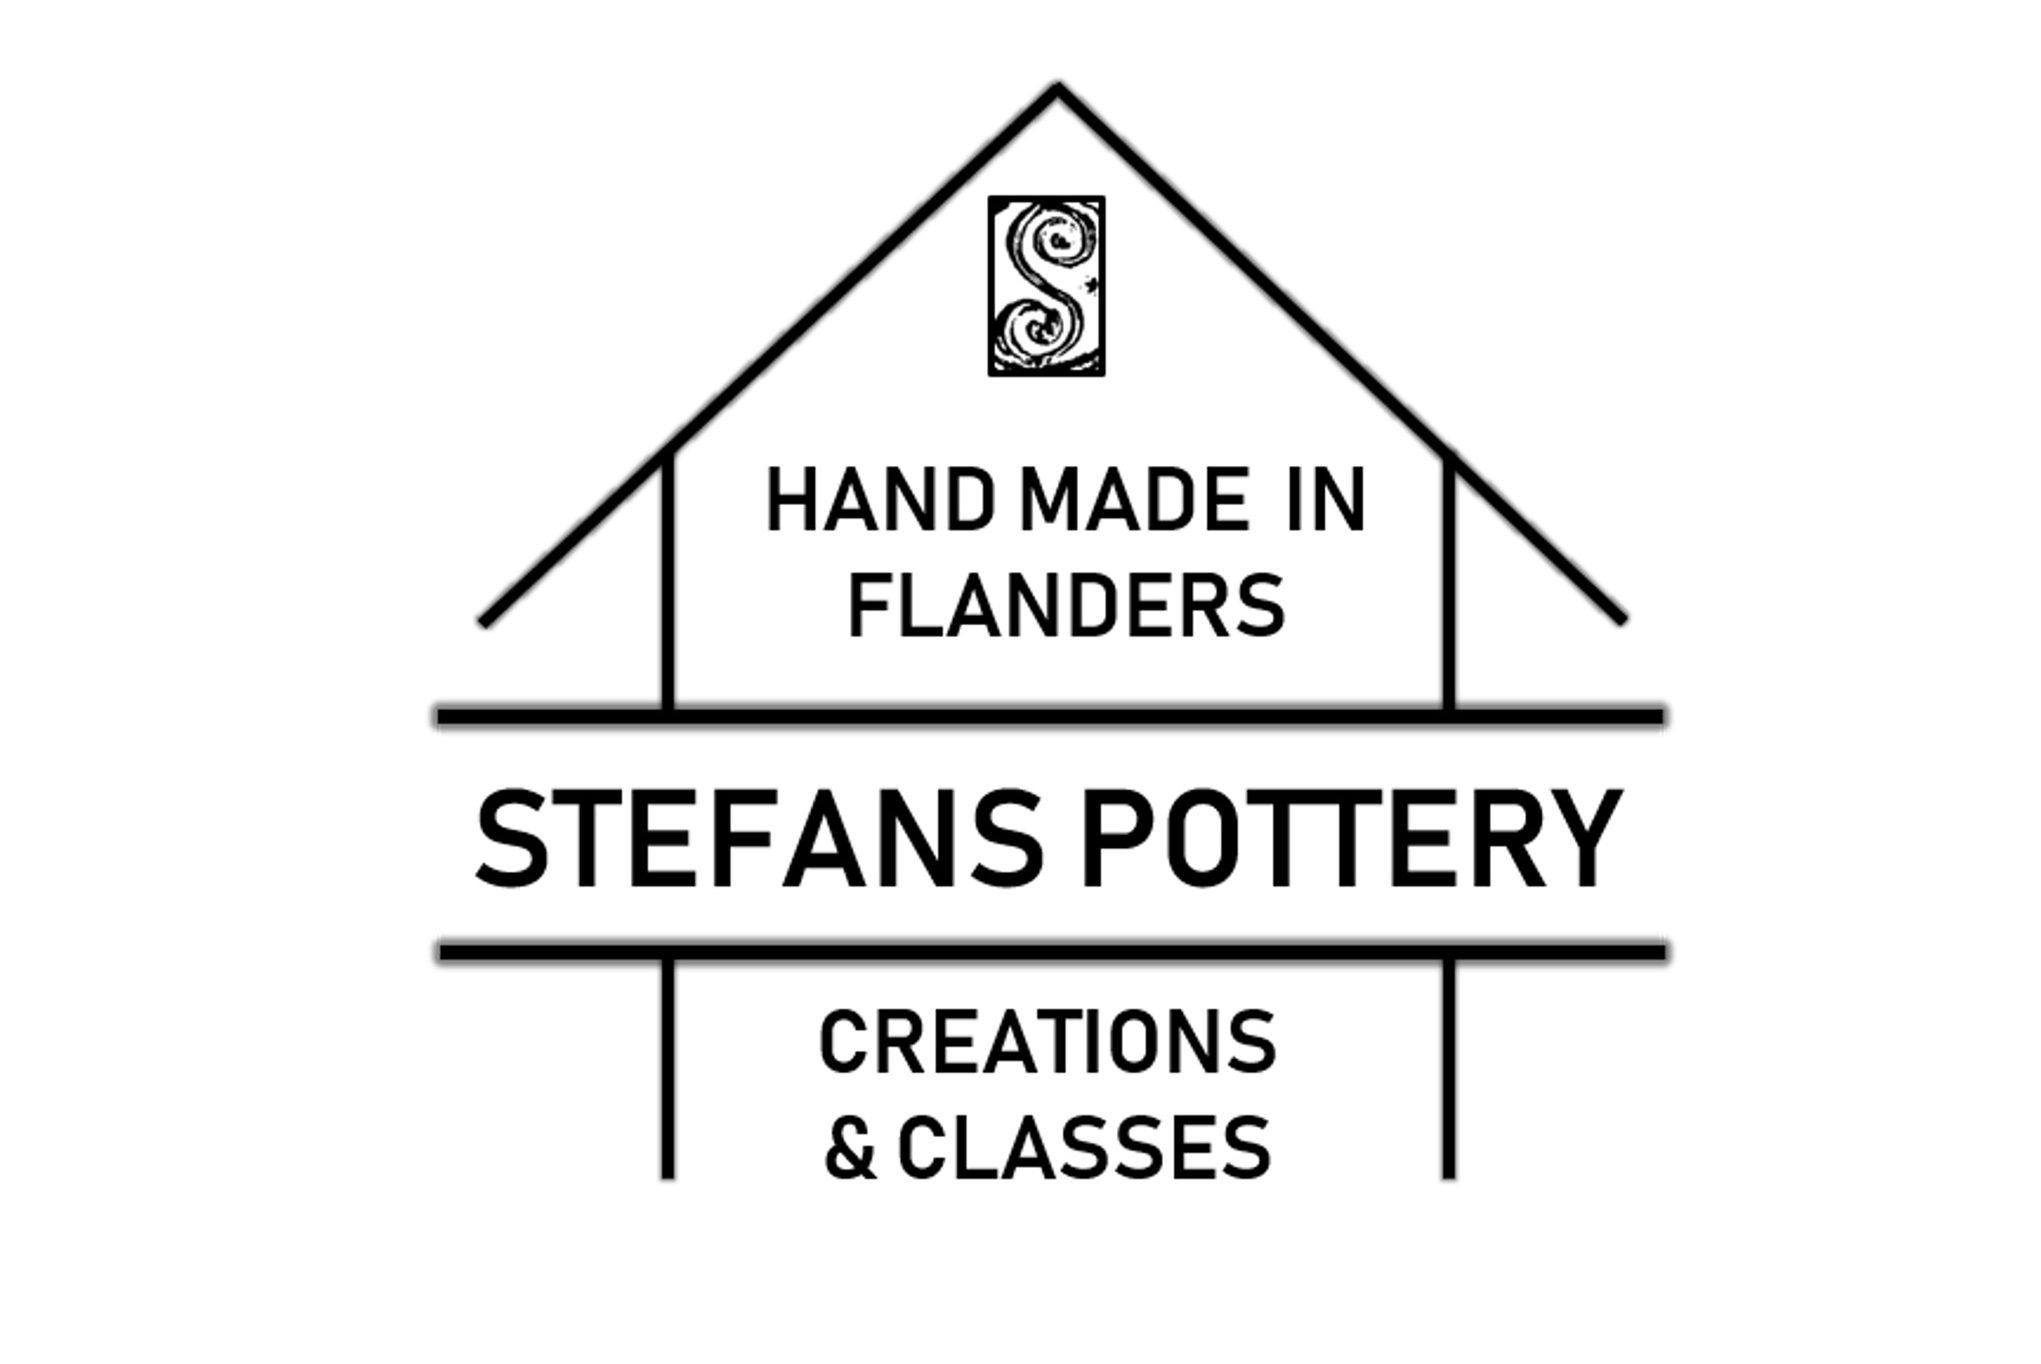 STEFANS POTTERY